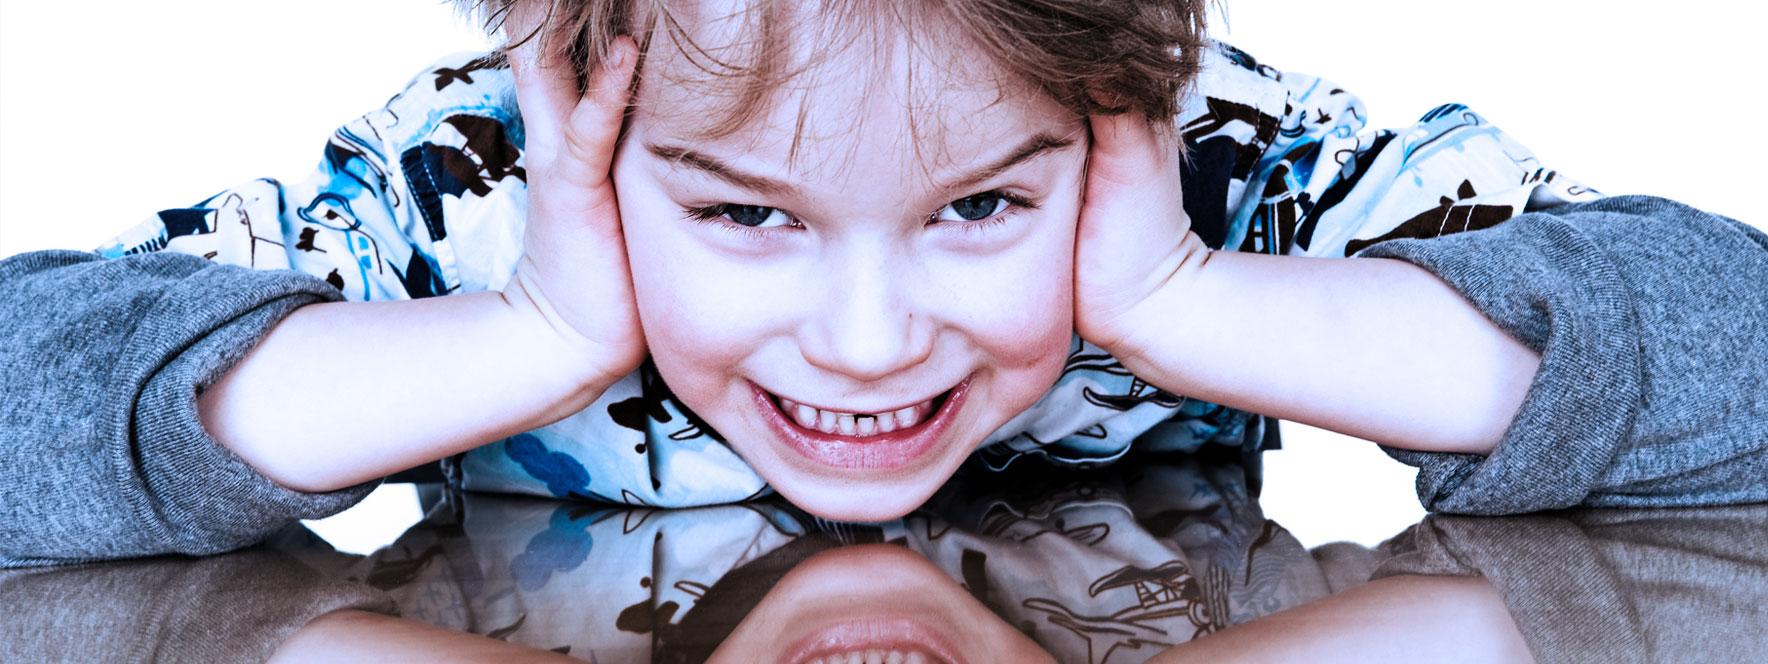 Un petit garçon stressé a besoin d'un soin en massothérapie